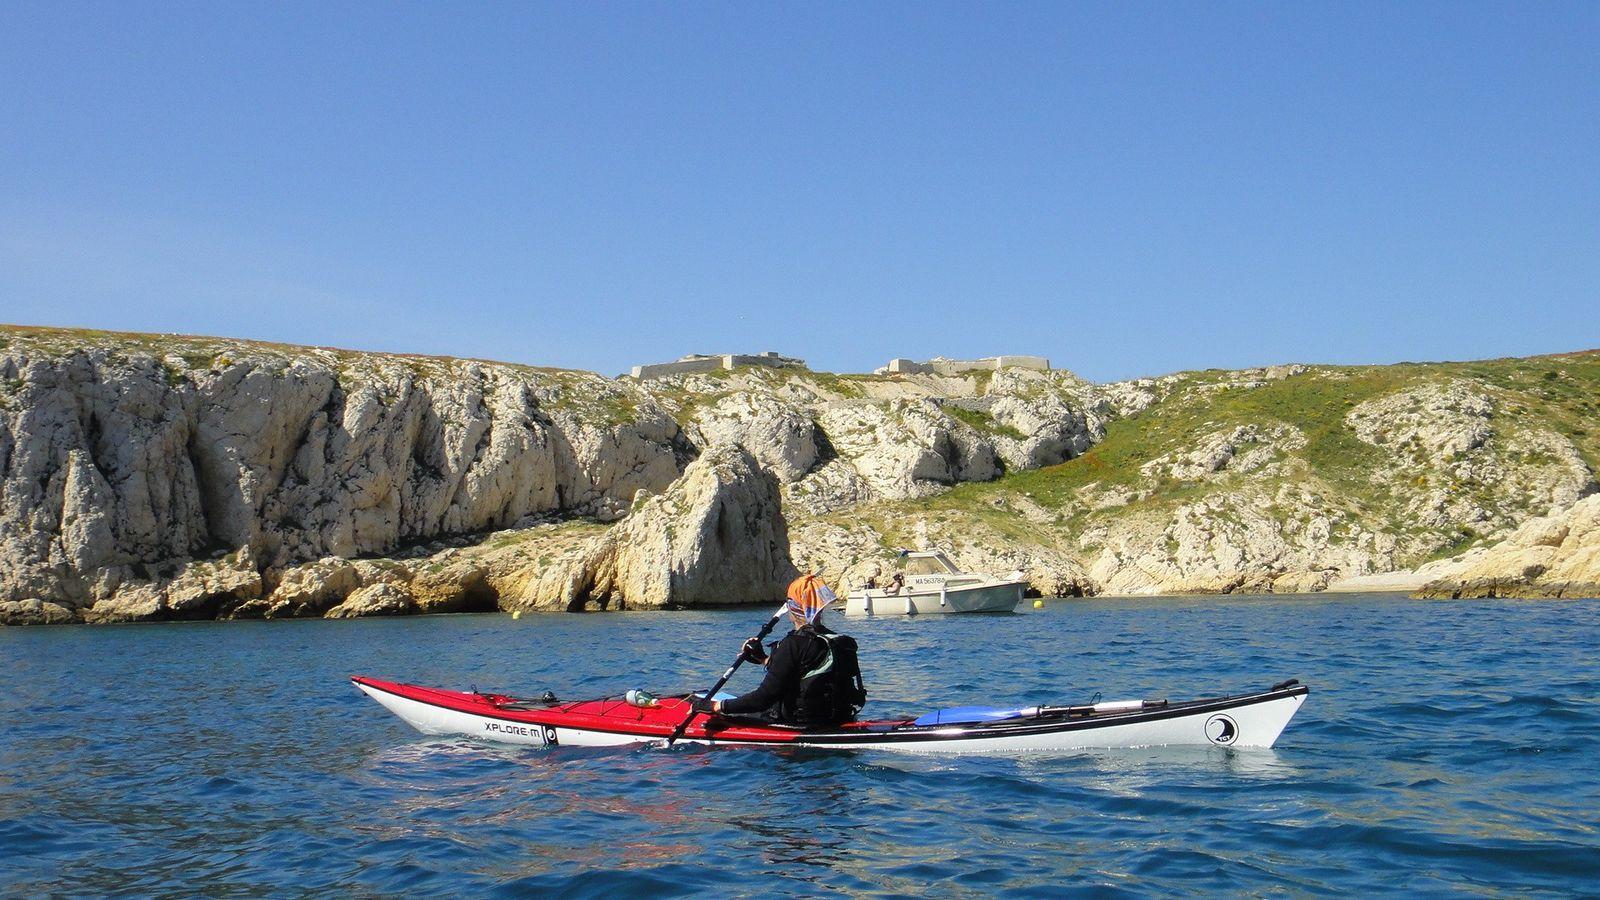 Méditerranée 2013 : l'archipel du Frioul